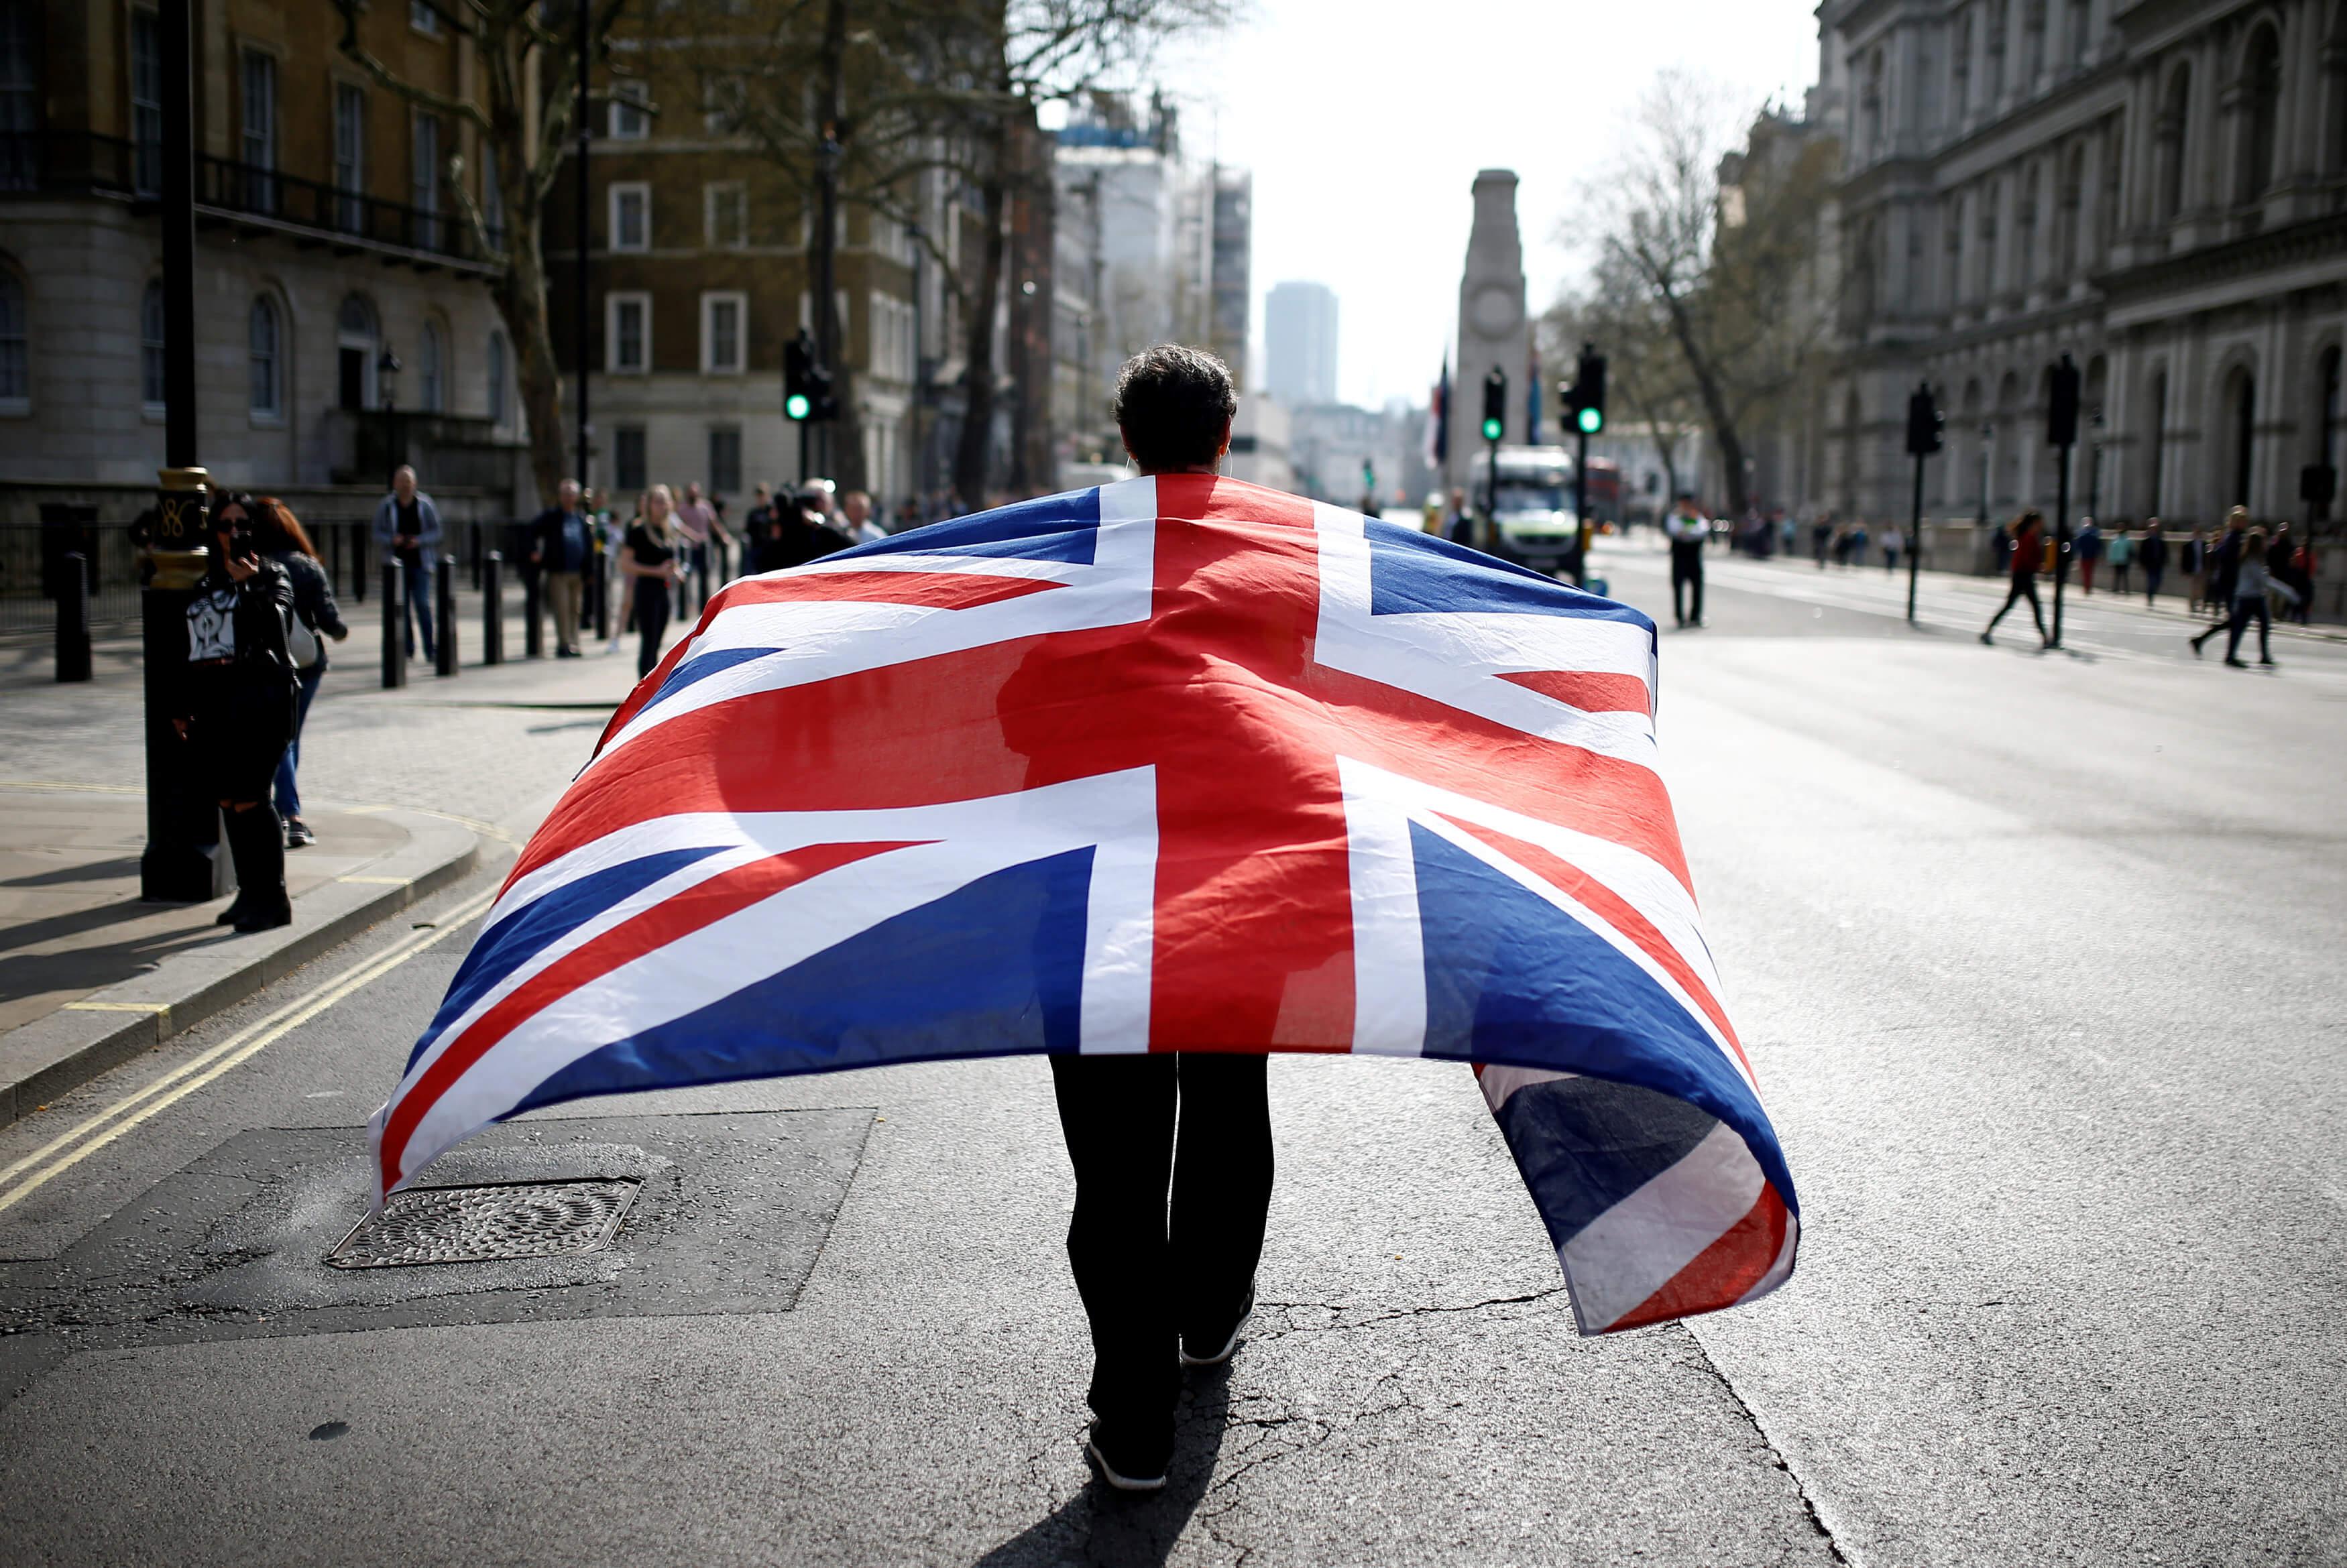 Brexit: Έγινε το πρώτο βήμα ανάμεσα σε Μέι και Κόρμπιν – Που συμφώνησαν